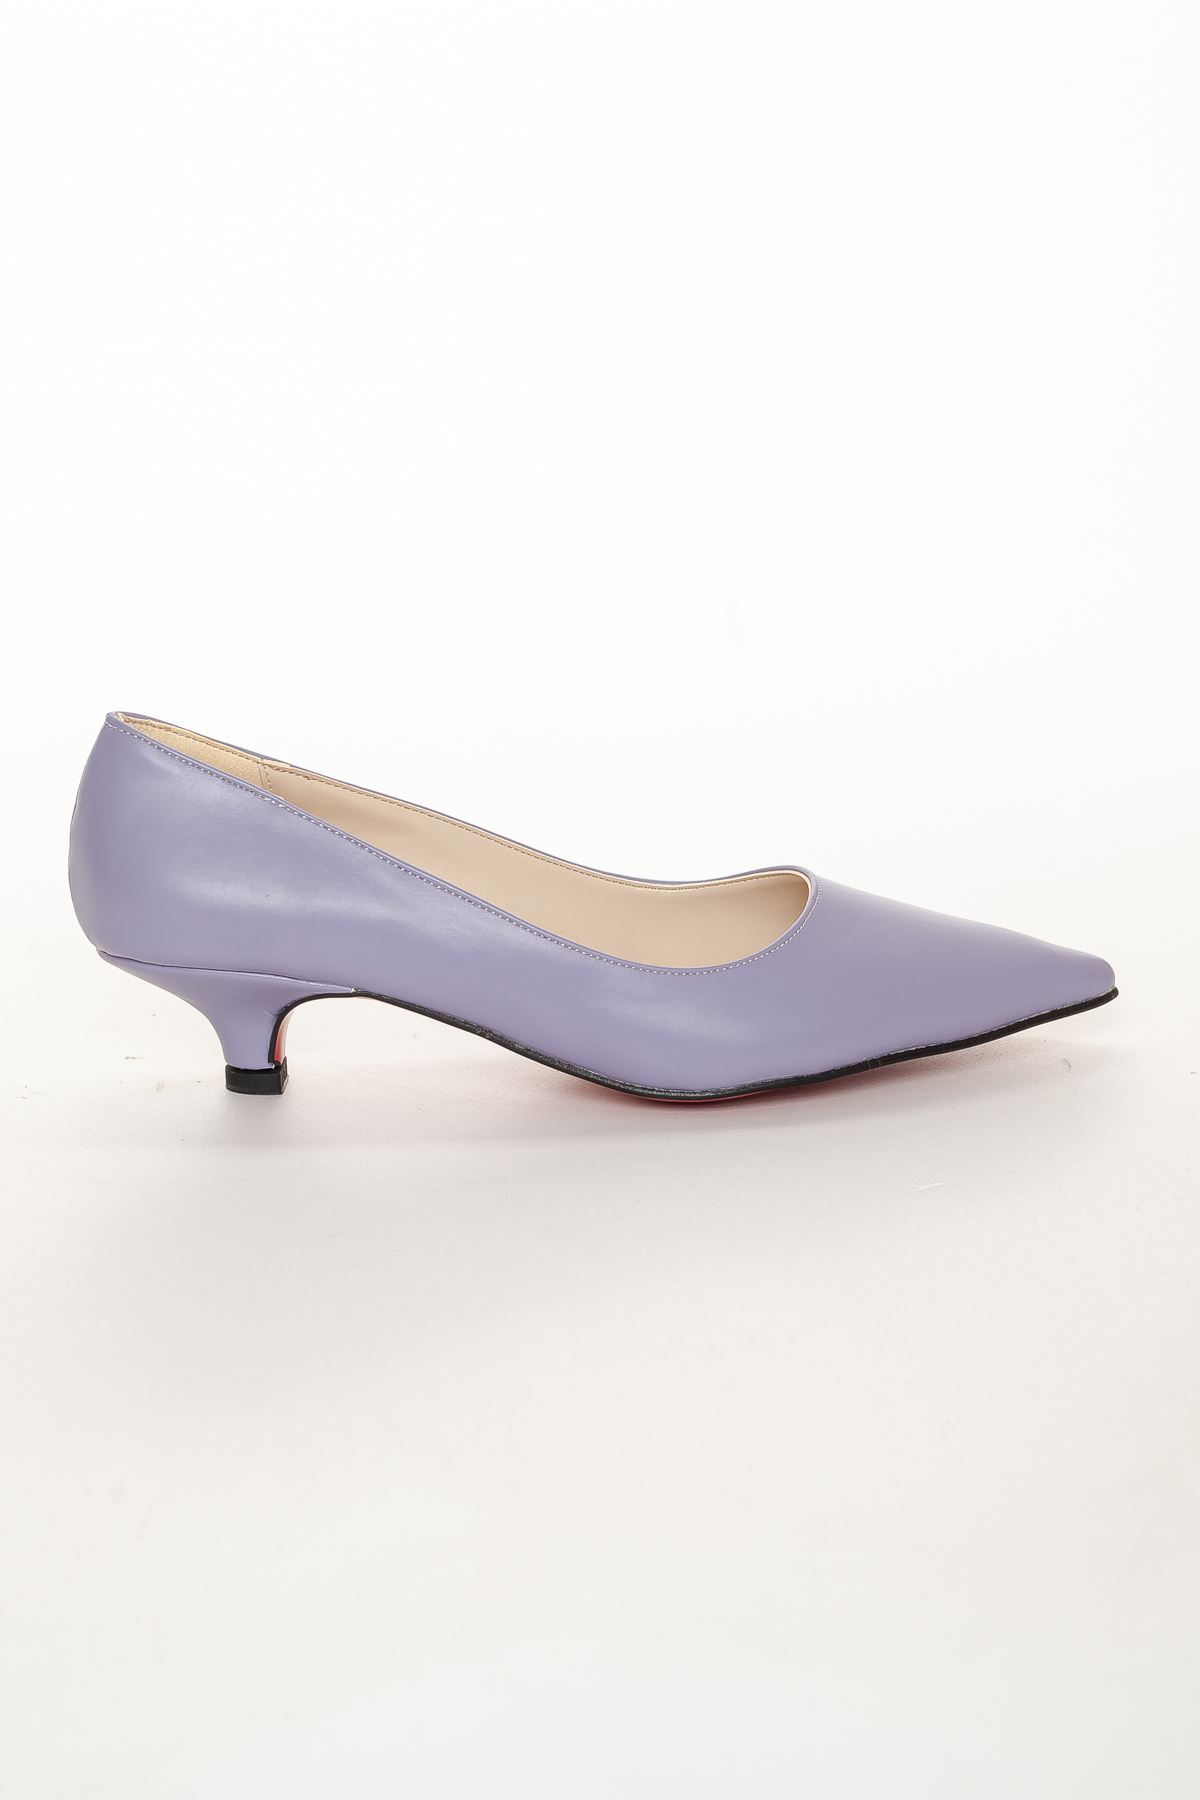 Odella Topuklu Ayakkabı LİLA